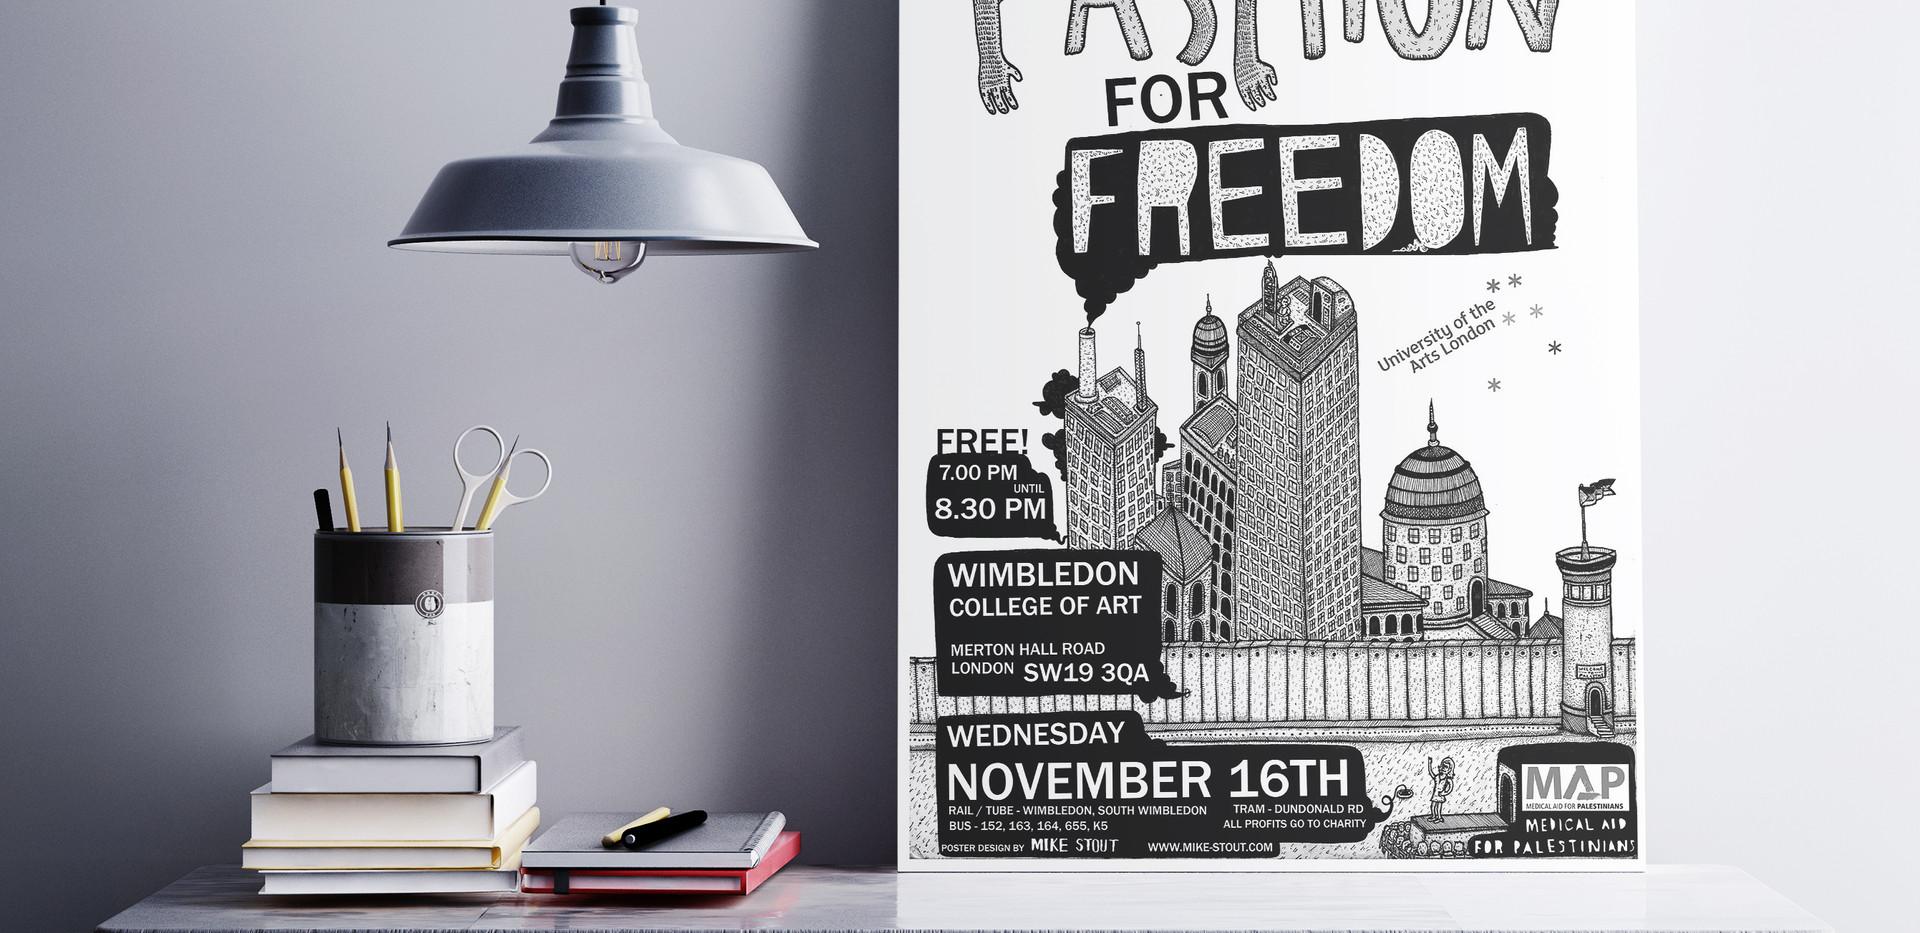 FASHION FREEDOM POSTER MOCKUP.jpg